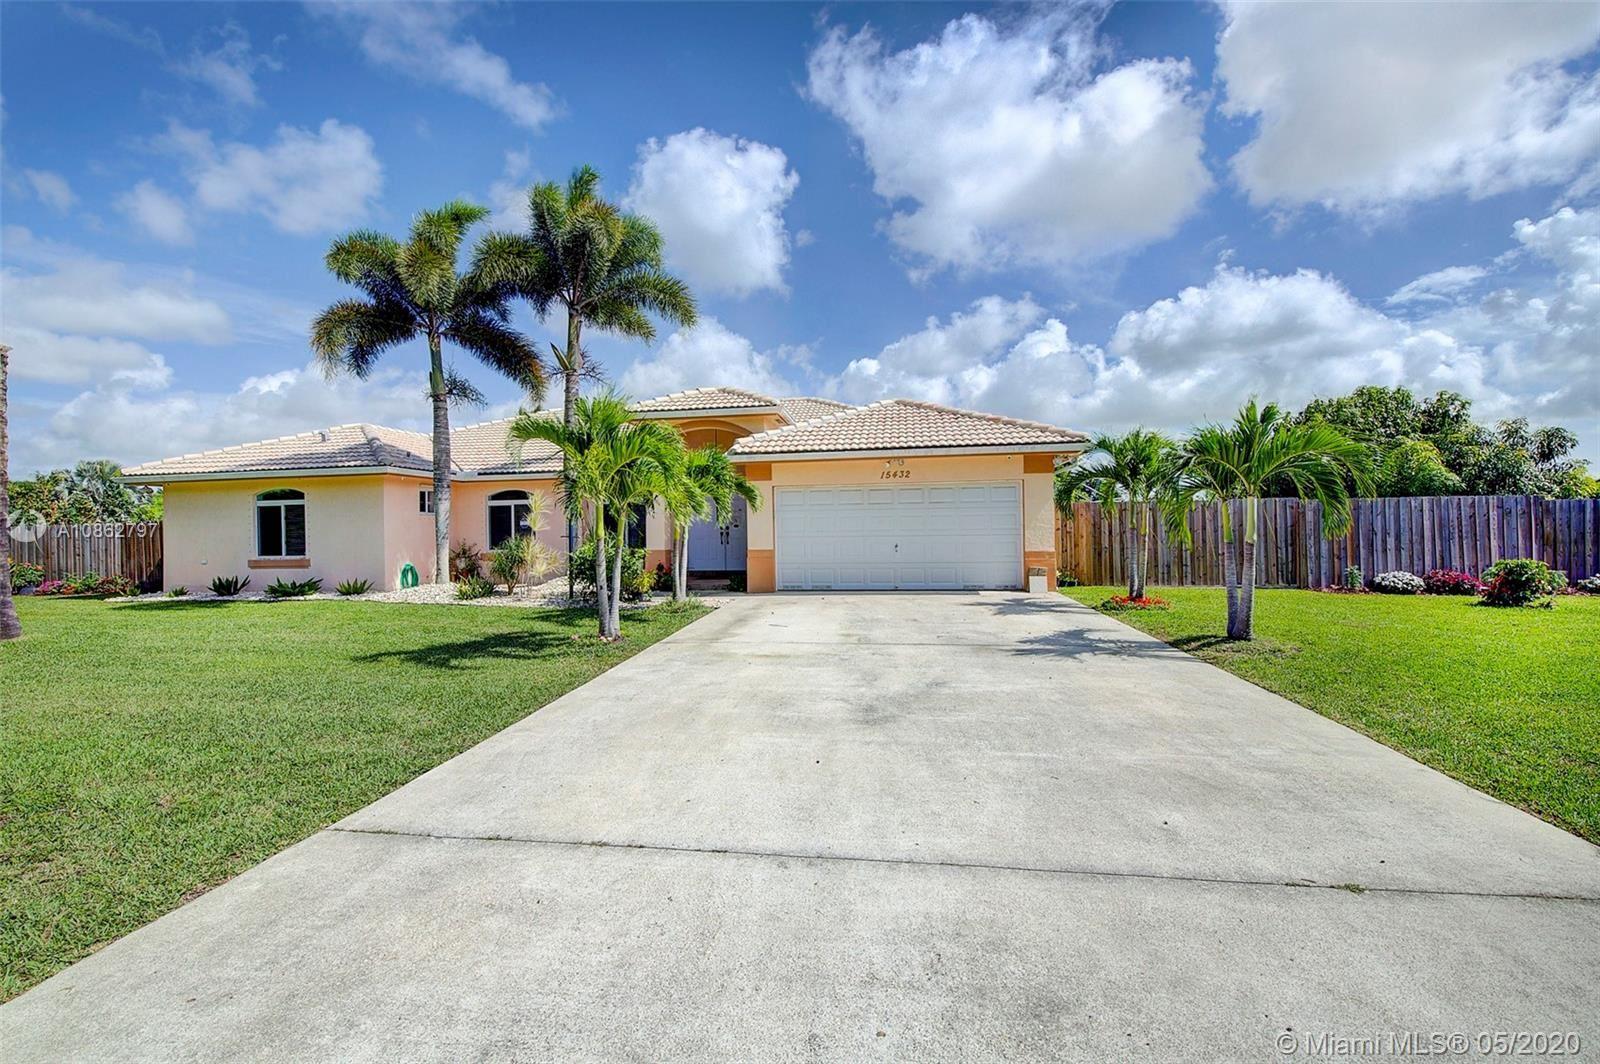 Photo of 15432 SW 277th St, Homestead, FL 33032 (MLS # A10862797)